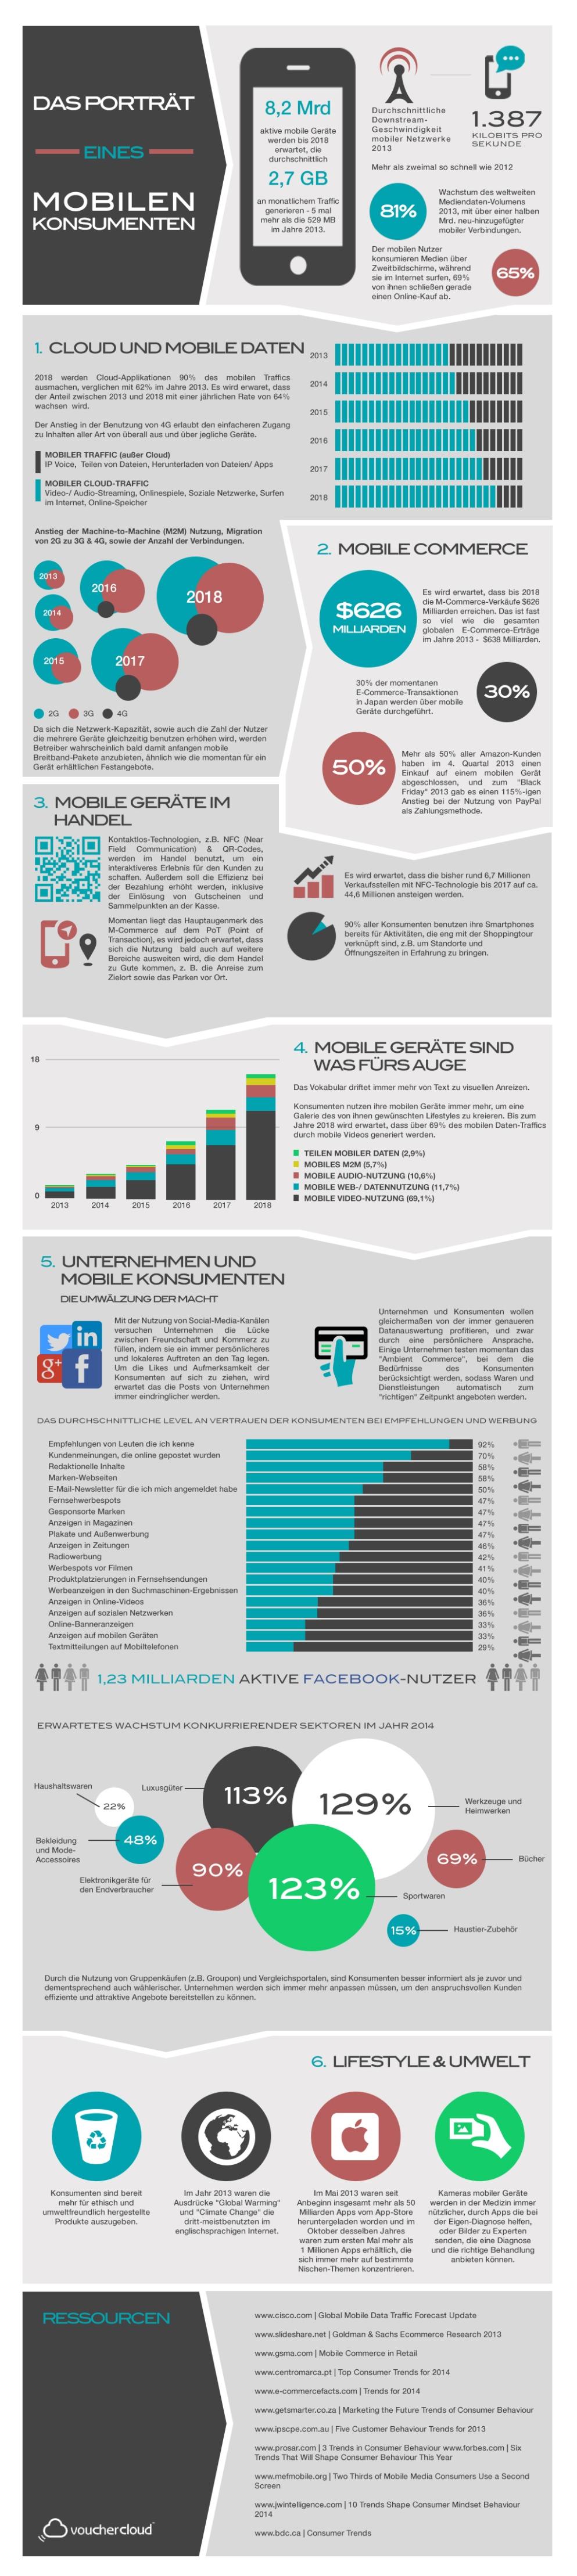 Infografik Porträt des mobilen Konsumenten.